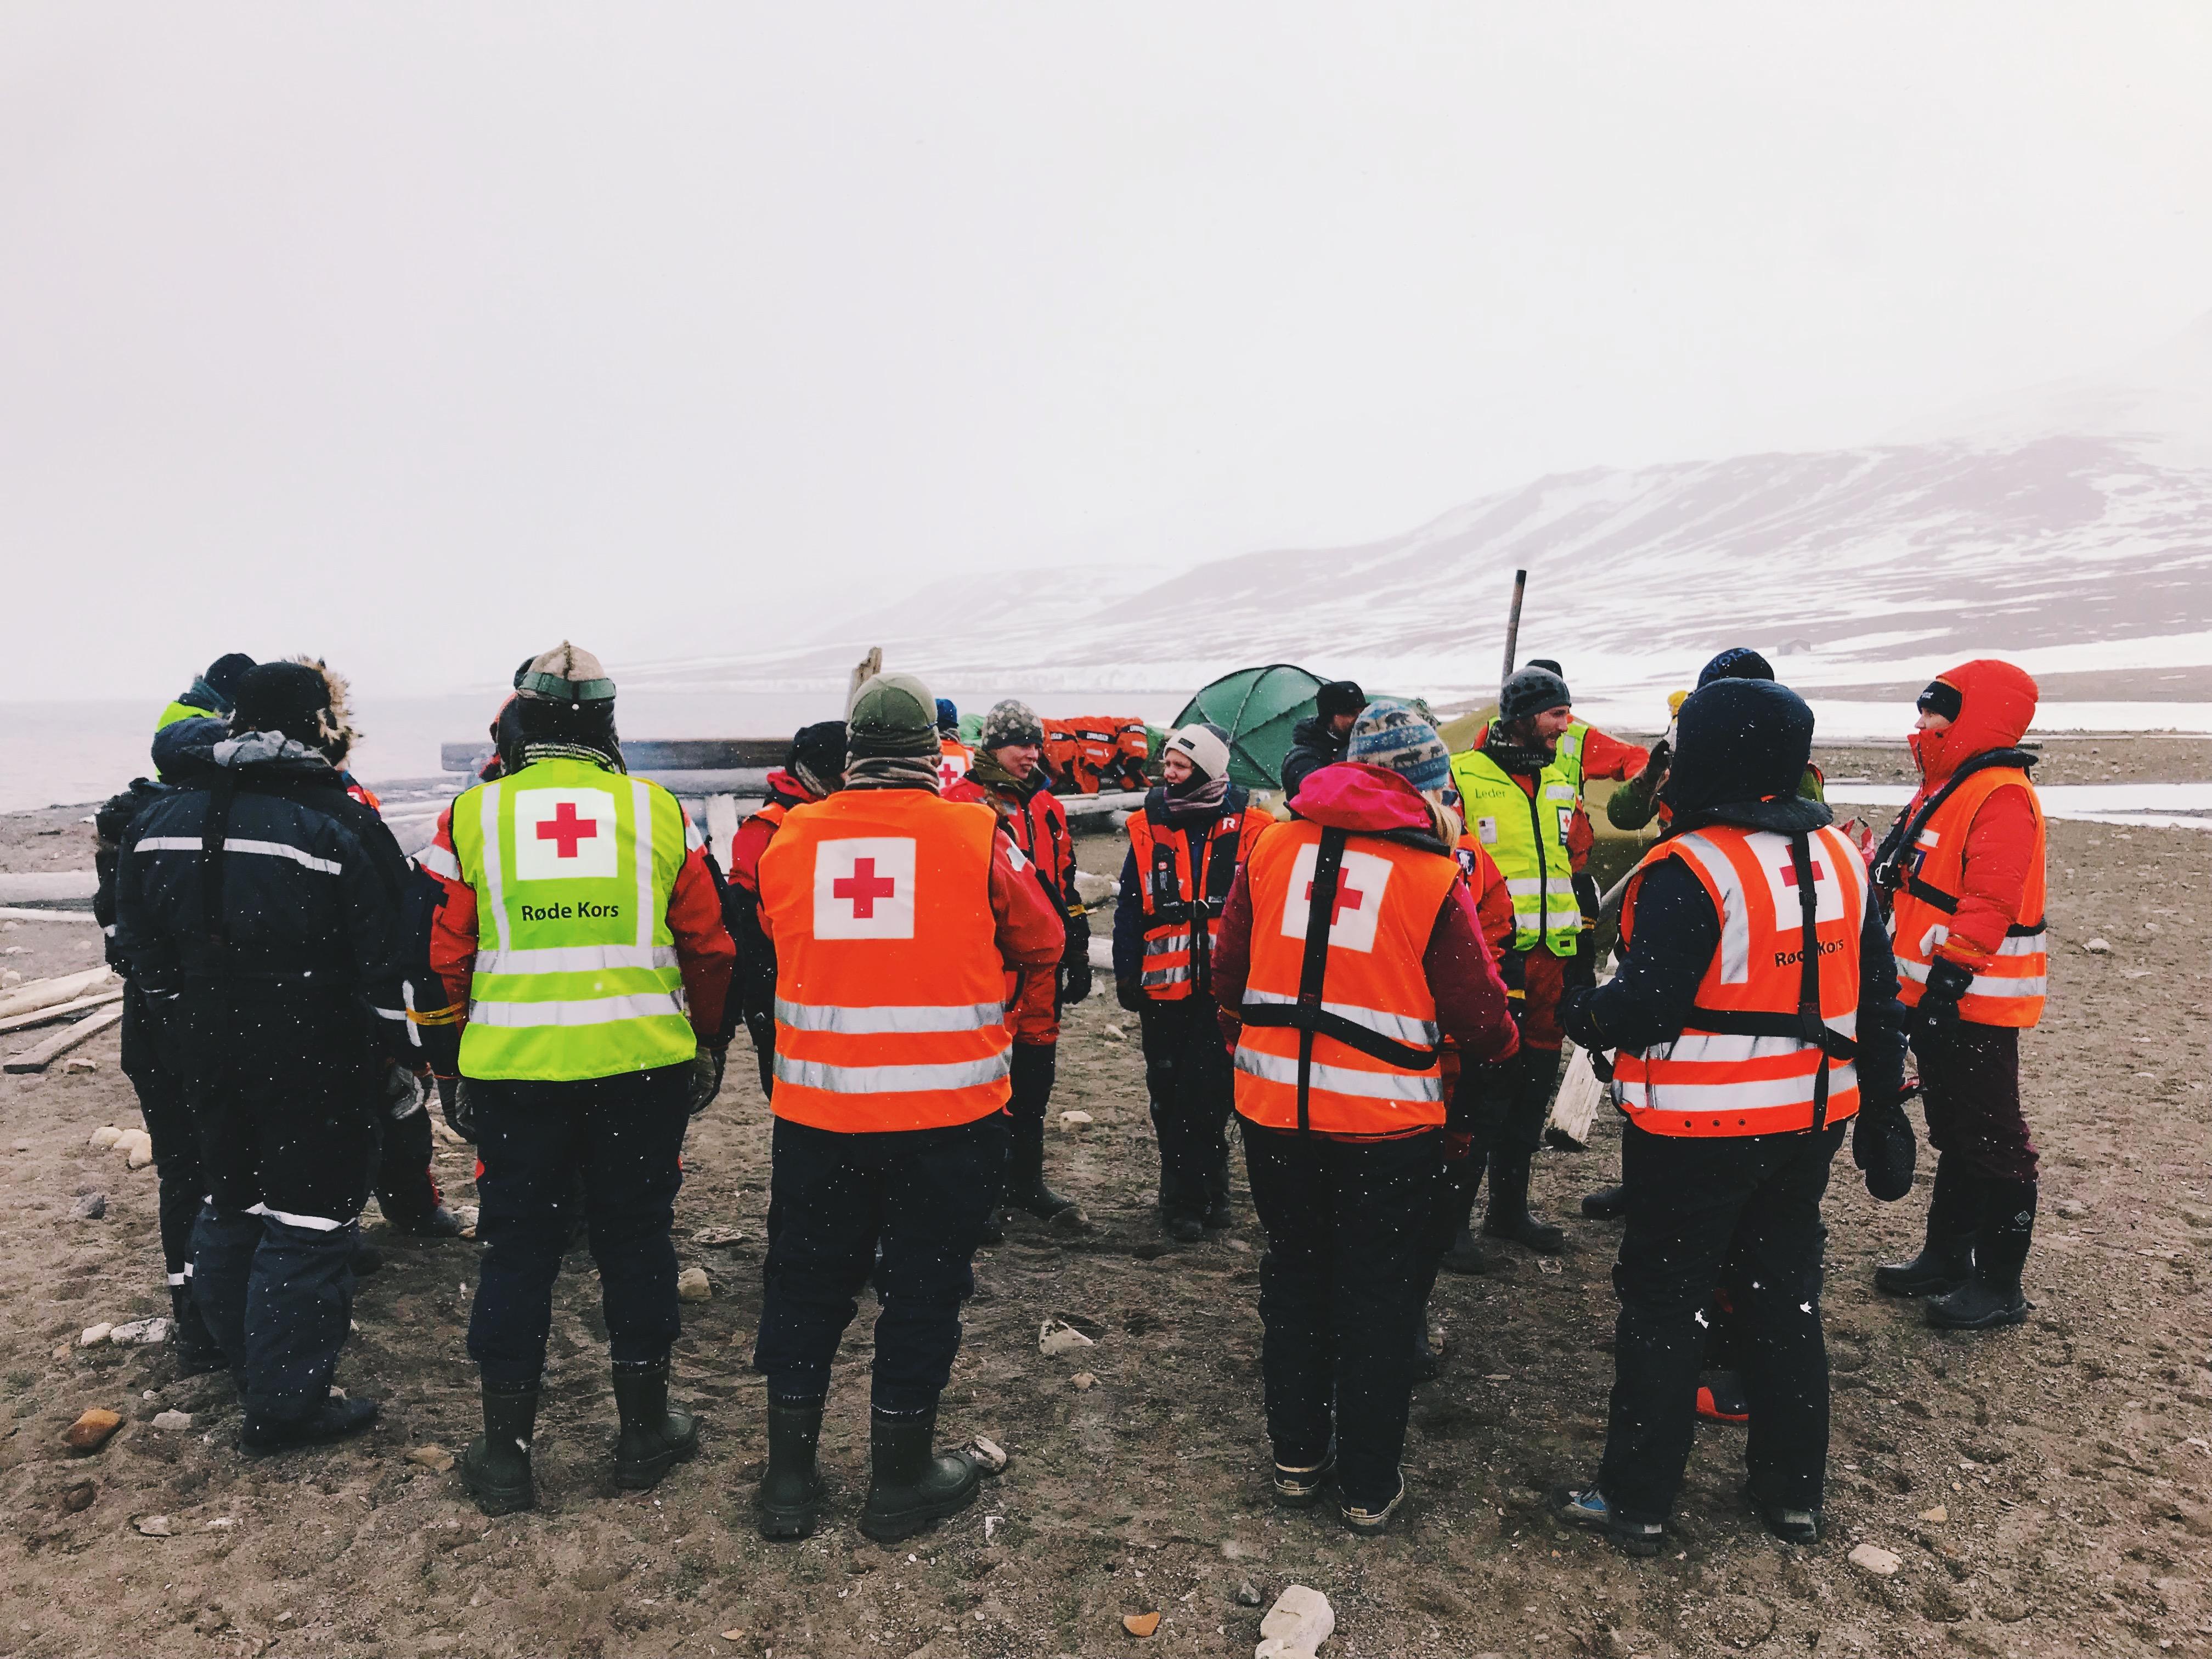 Mannskaper fra Røde Kors samles under SARex Svalbard på Deltaneset.